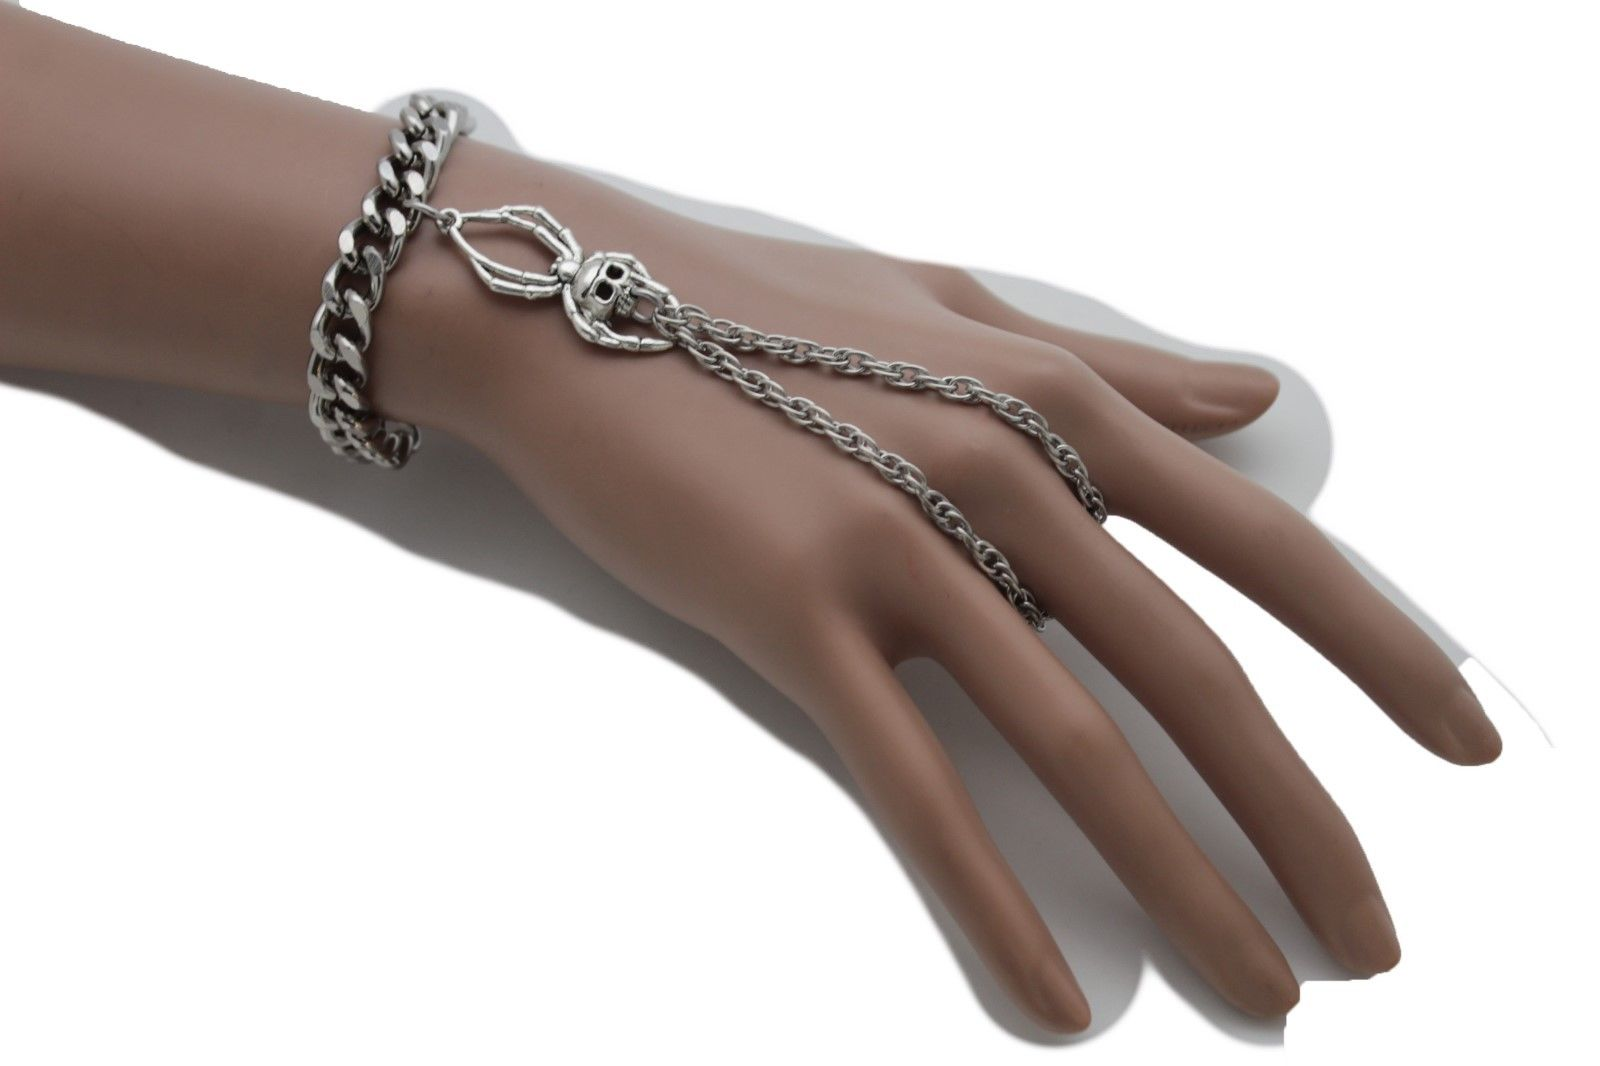 Sterling Silver Ring Bracelet bohemian style body bracelet hand chain bracelet with adjustable wrist